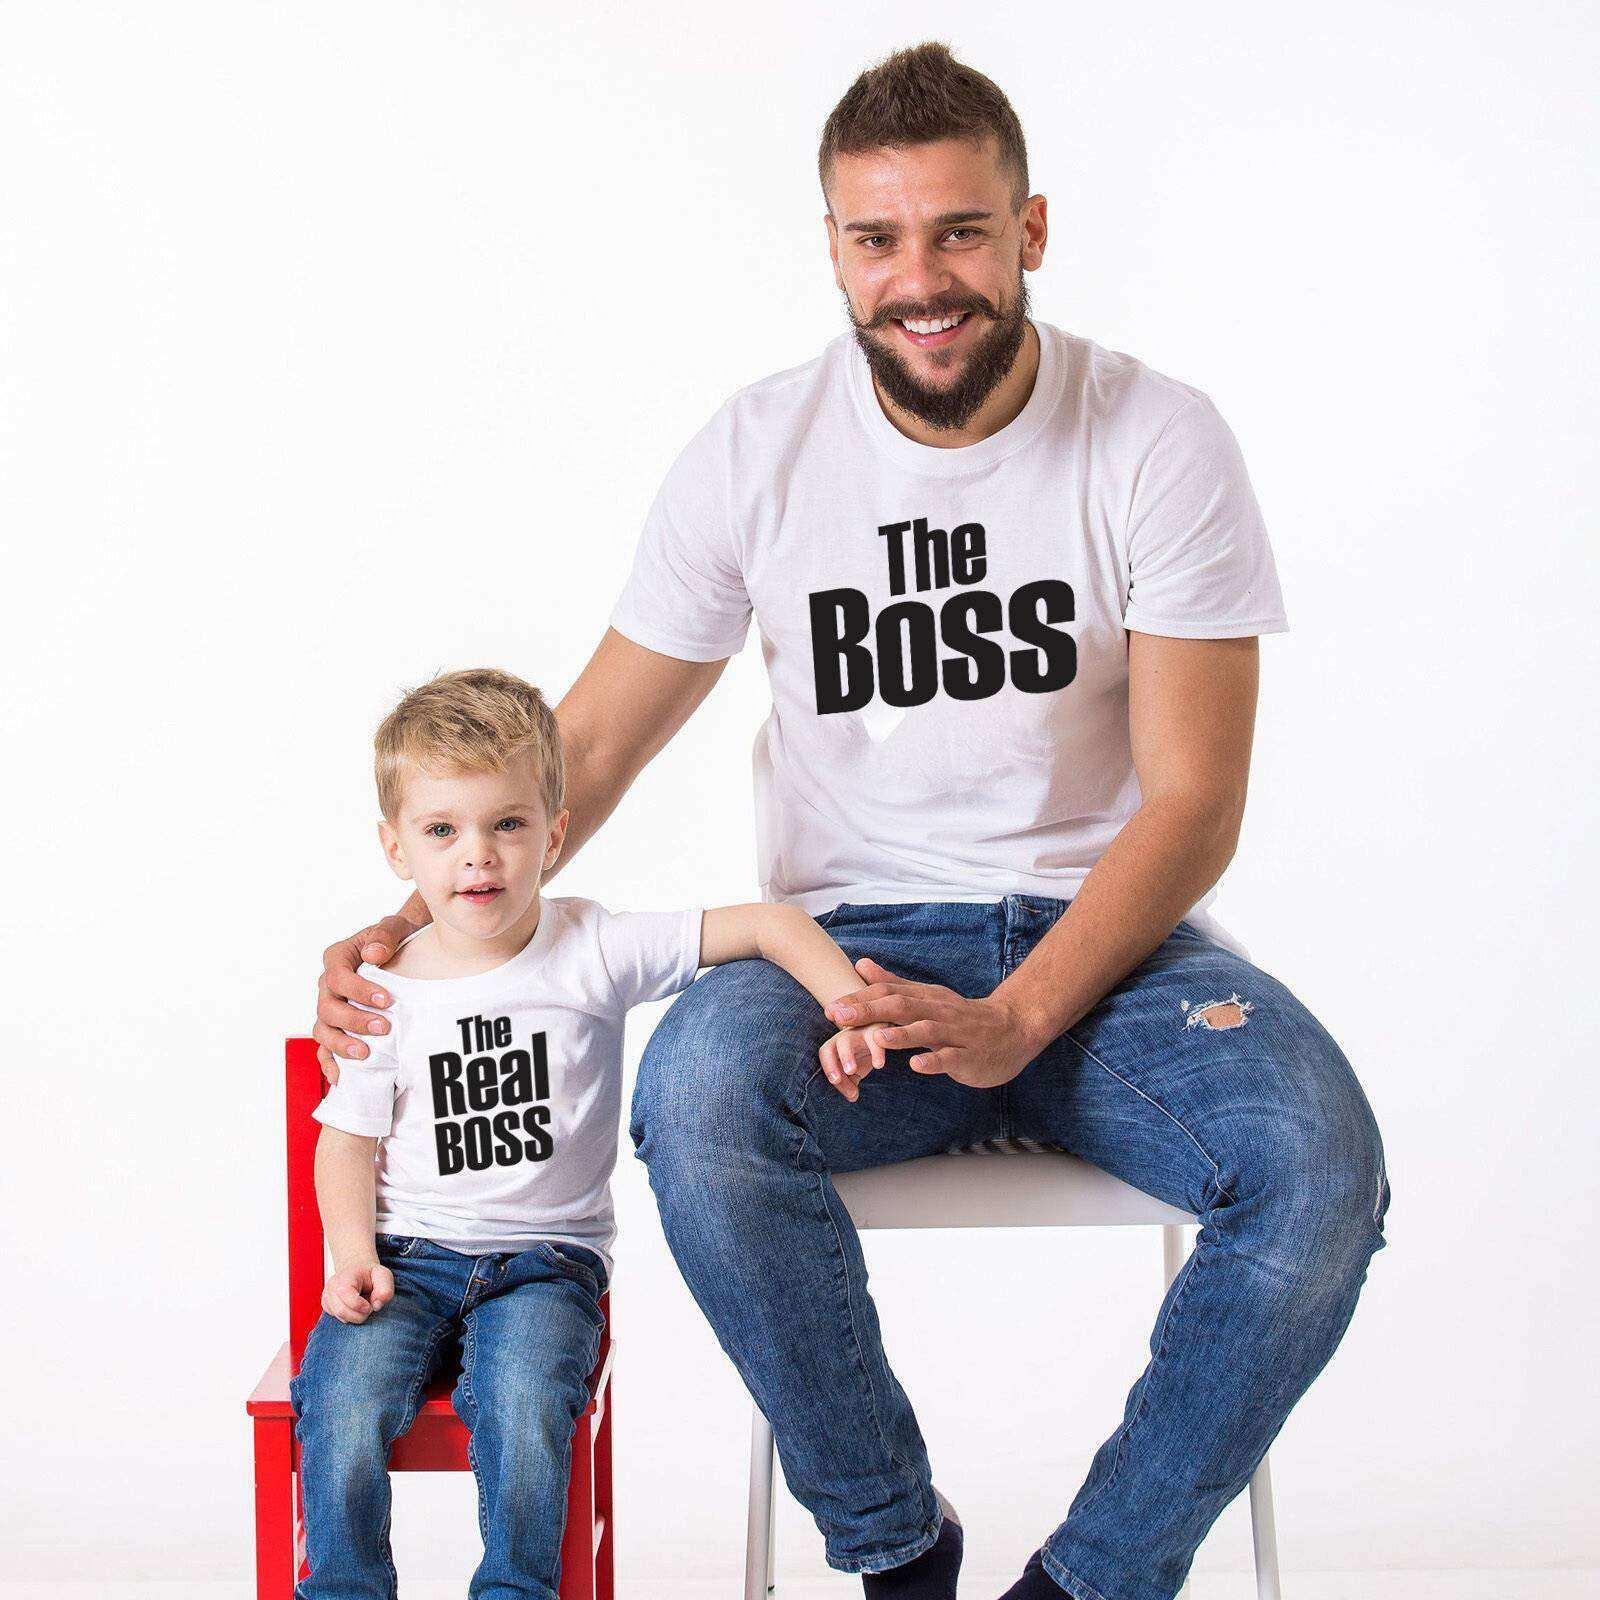 The Boss The Real Boss Baba oğul giyim